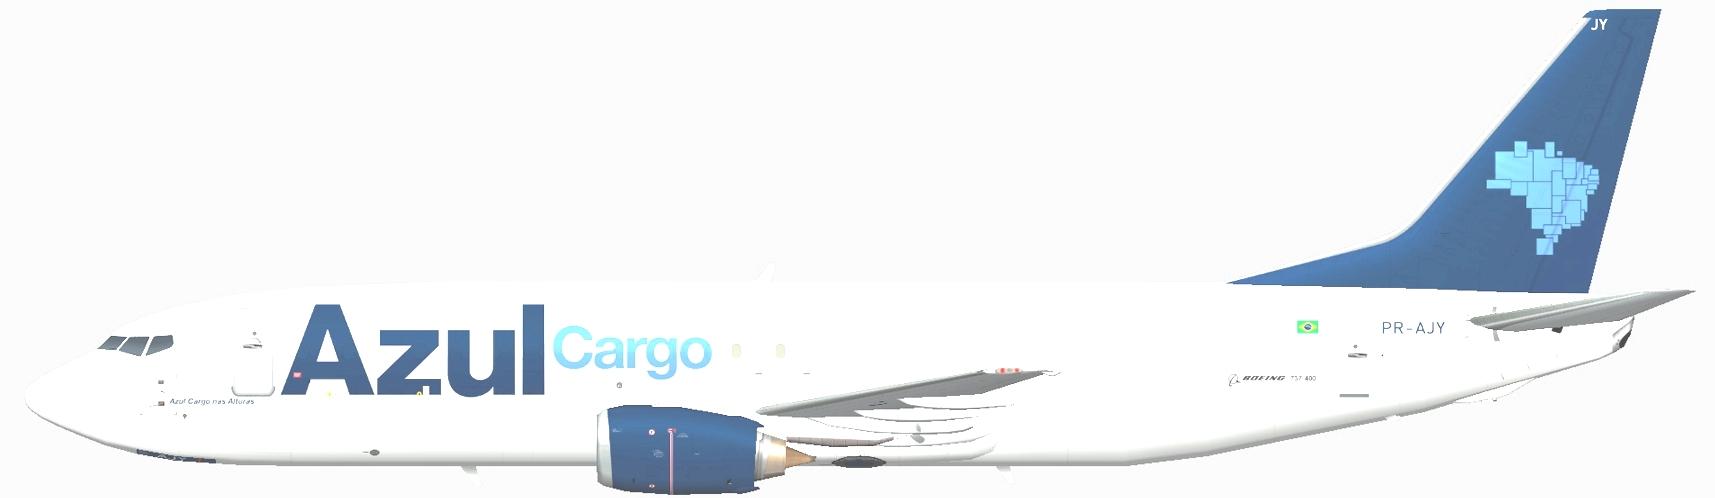 AZUL-Cargo-737-400F